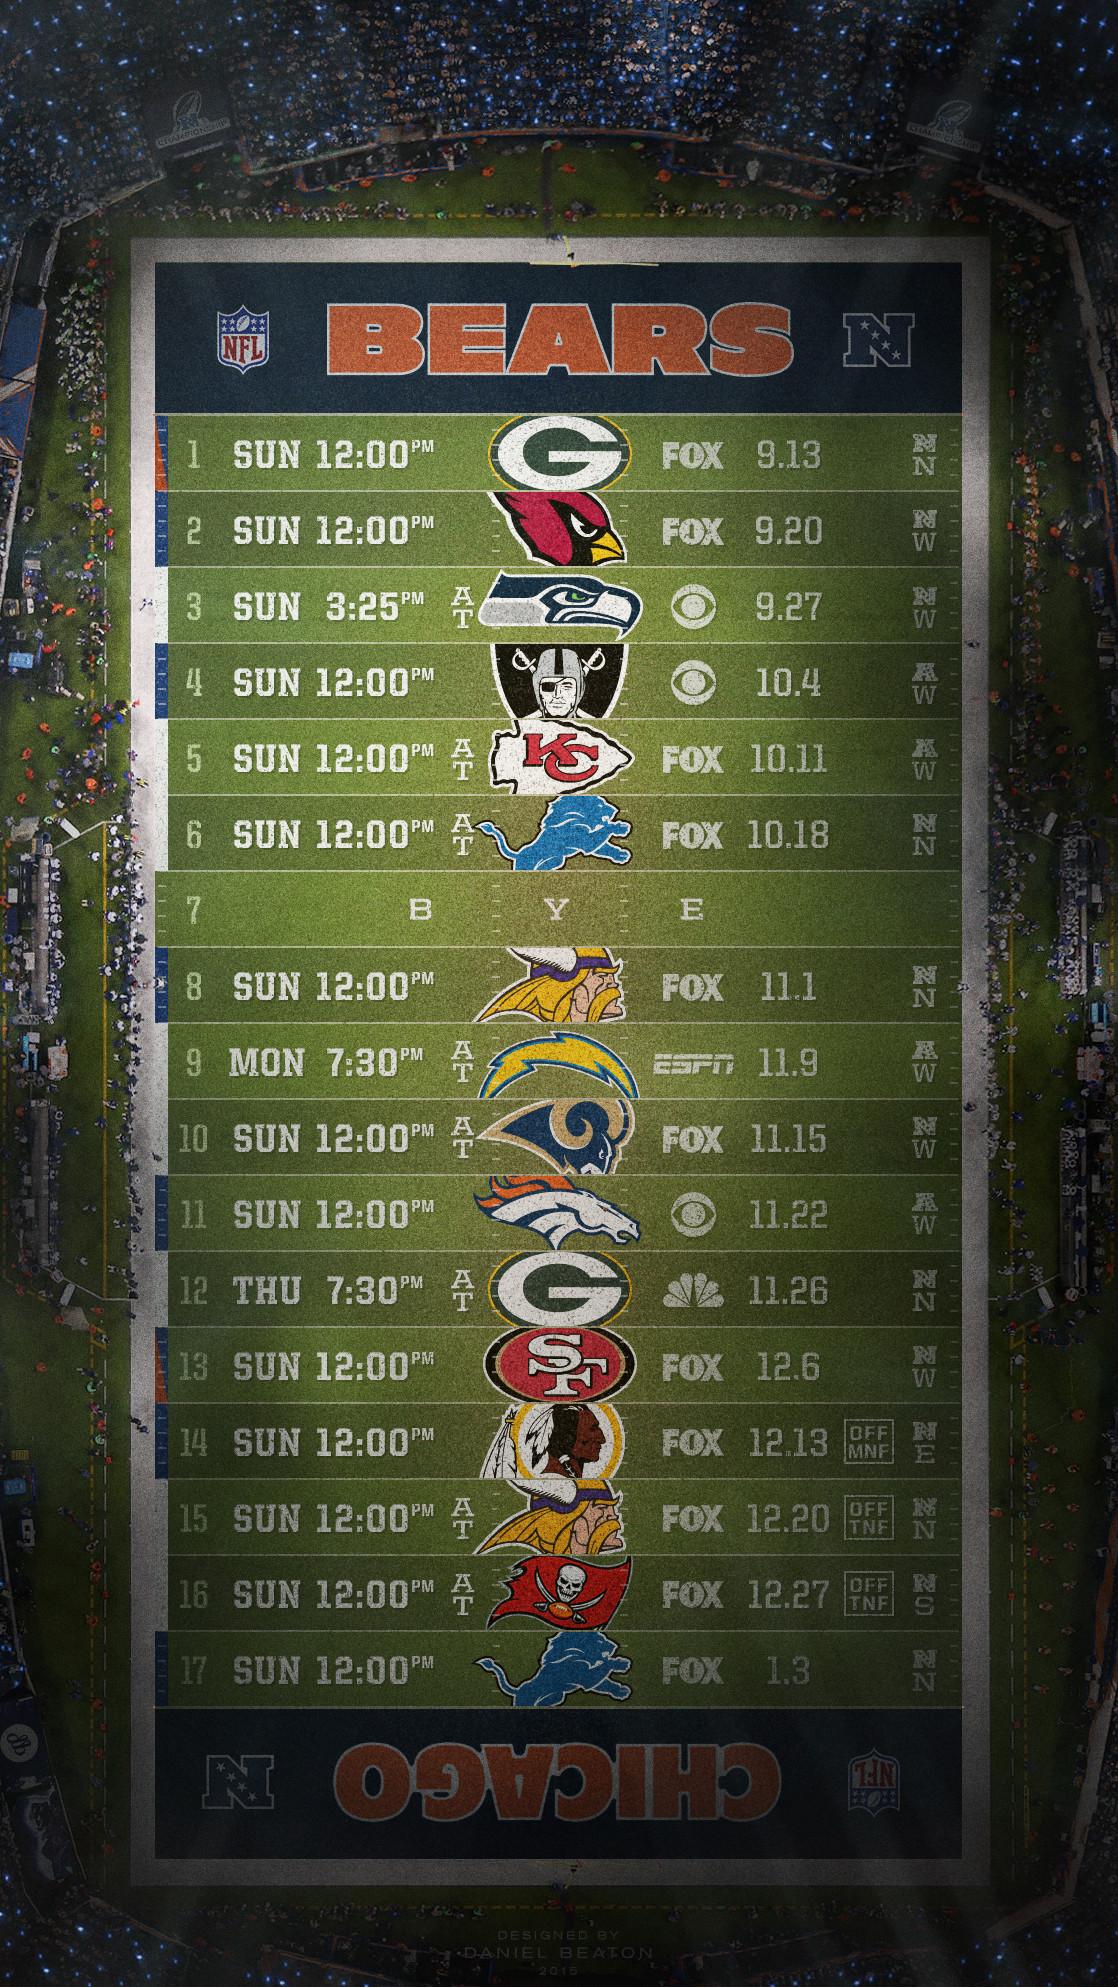 1920x1200 Green Bay Packers Wallpaper By Bryan C Pier